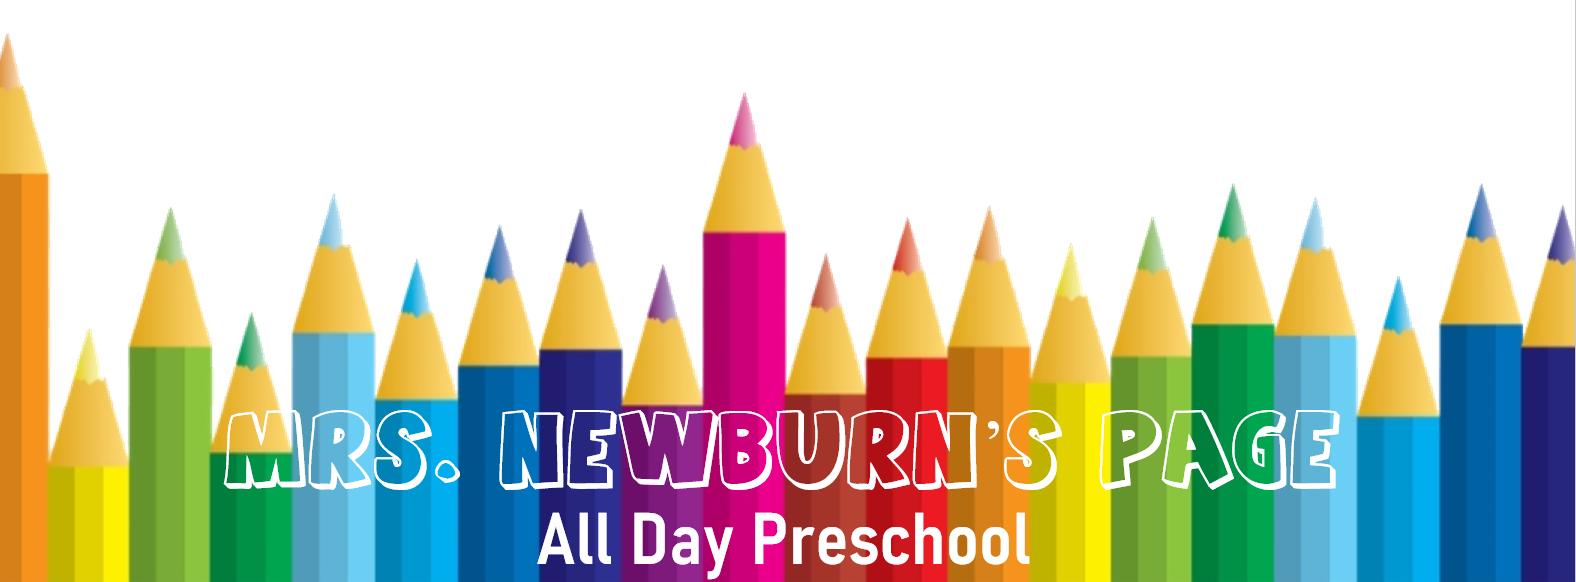 Mrs. Newburn's Page